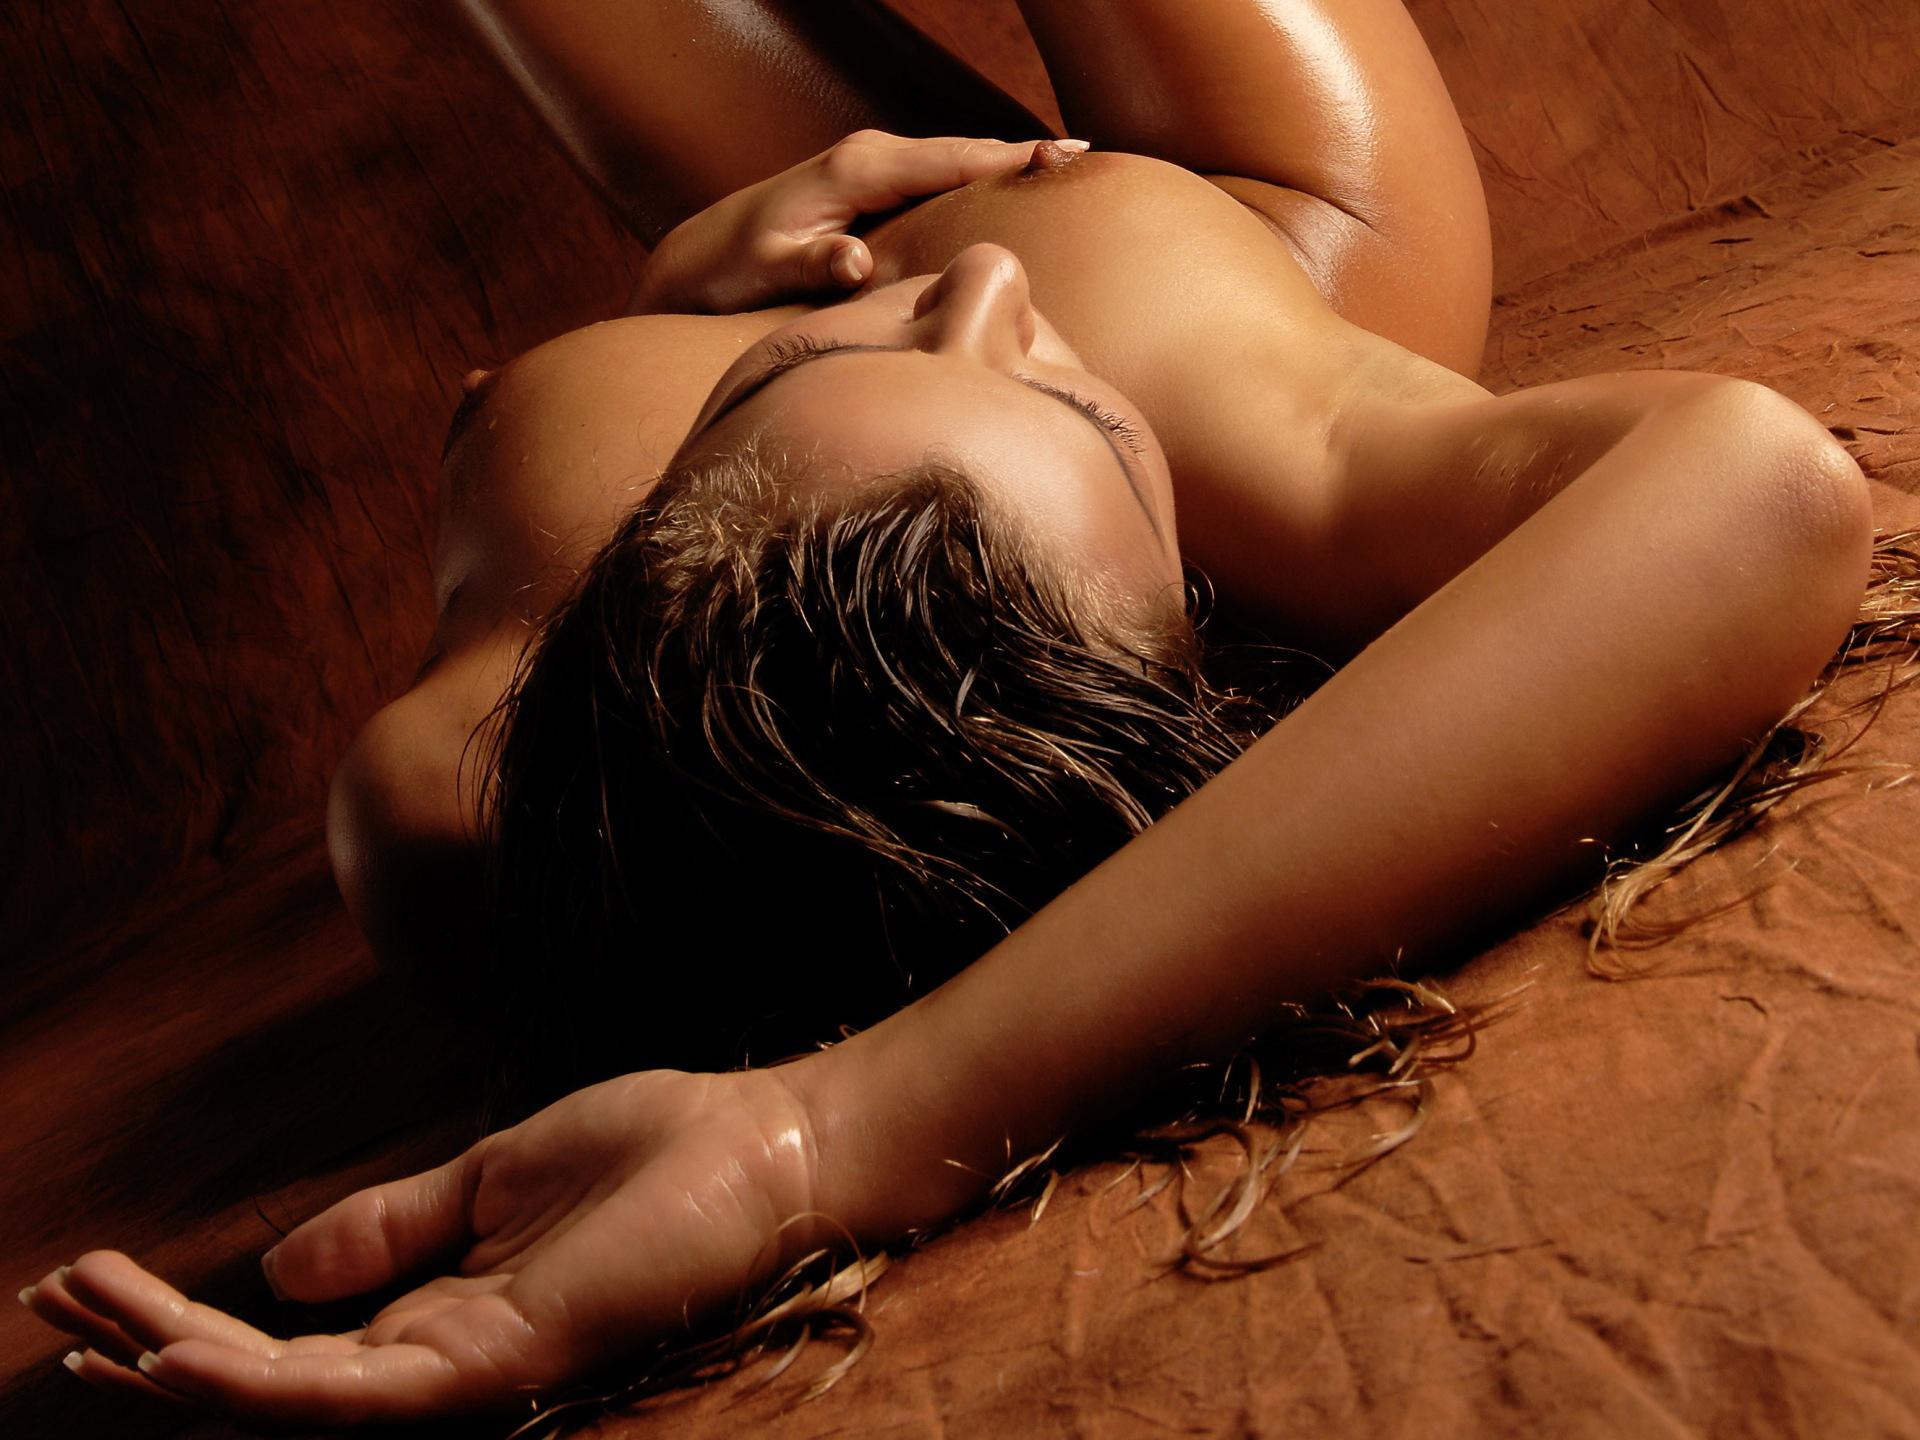 devushki-foto-kartinki-erotika